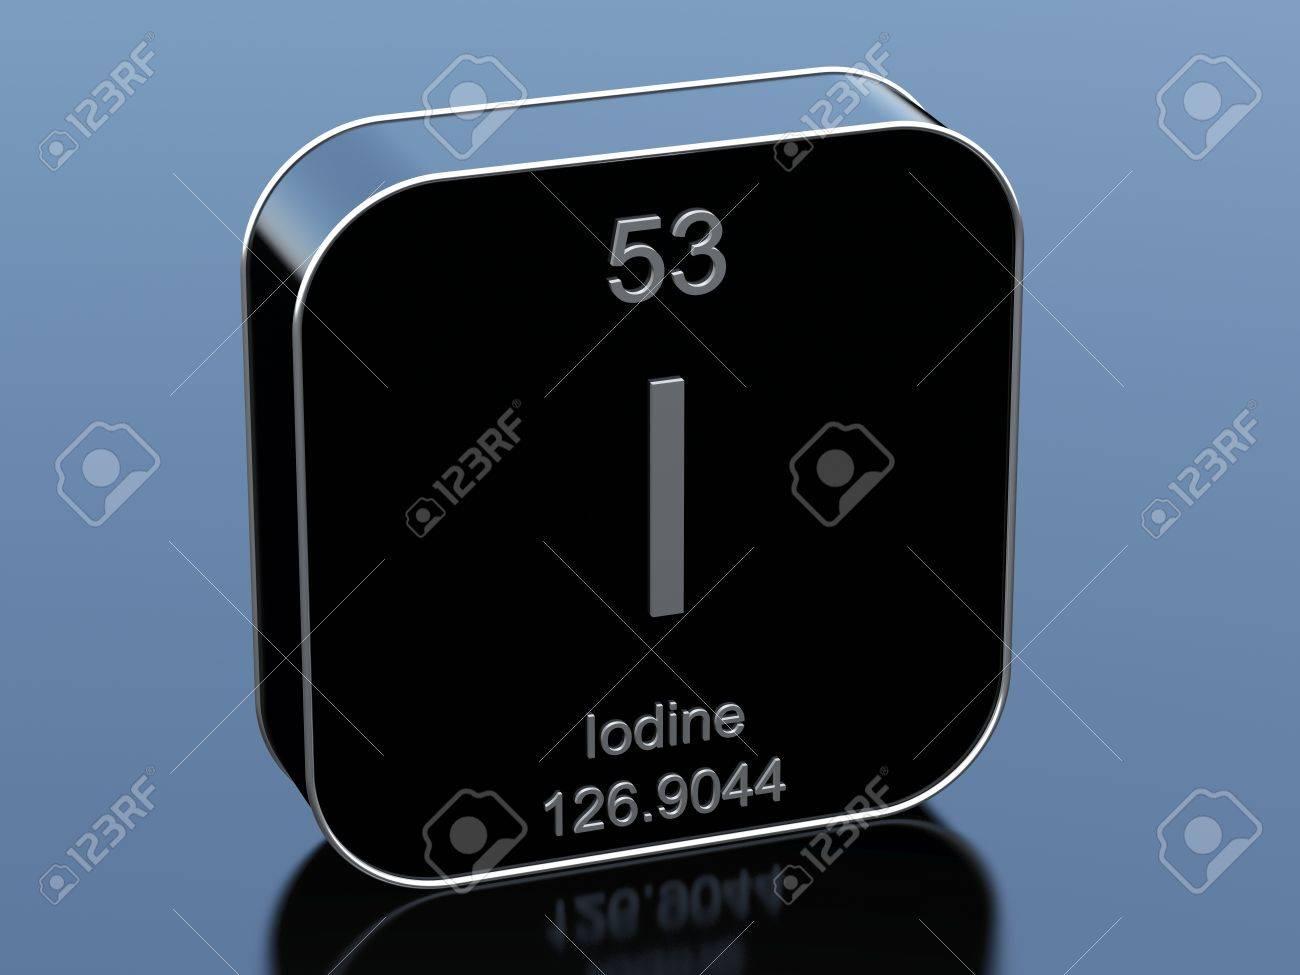 Iodine symbol from periodic table stock photo picture and royalty iodine symbol from periodic table stock photo 76322231 urtaz Image collections